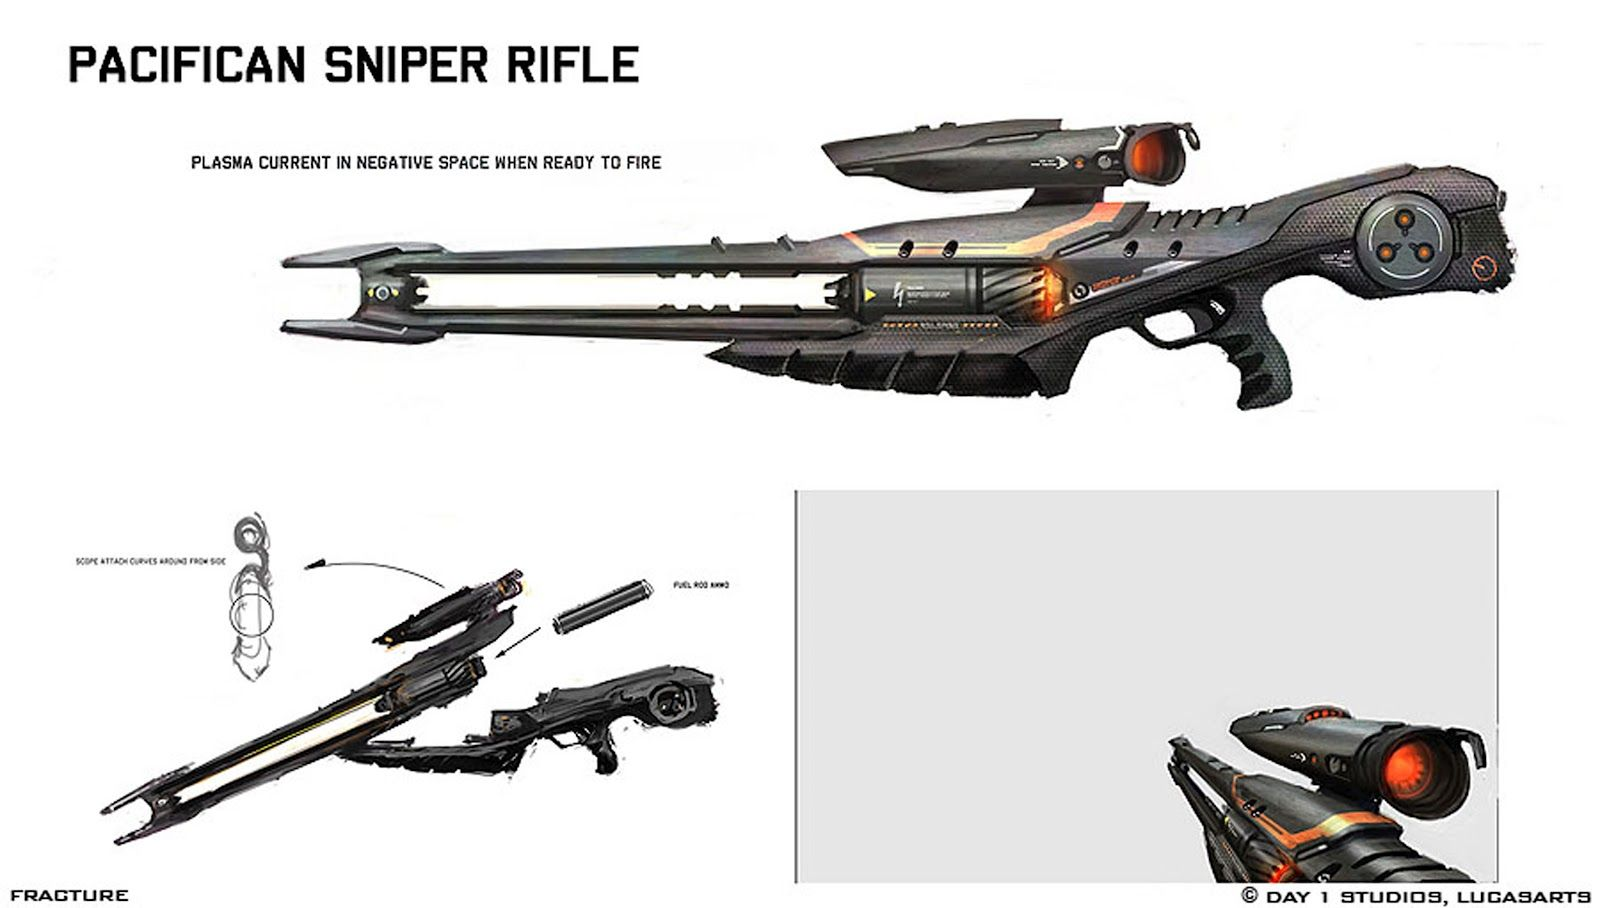 Pin on scifi 2 hand gun